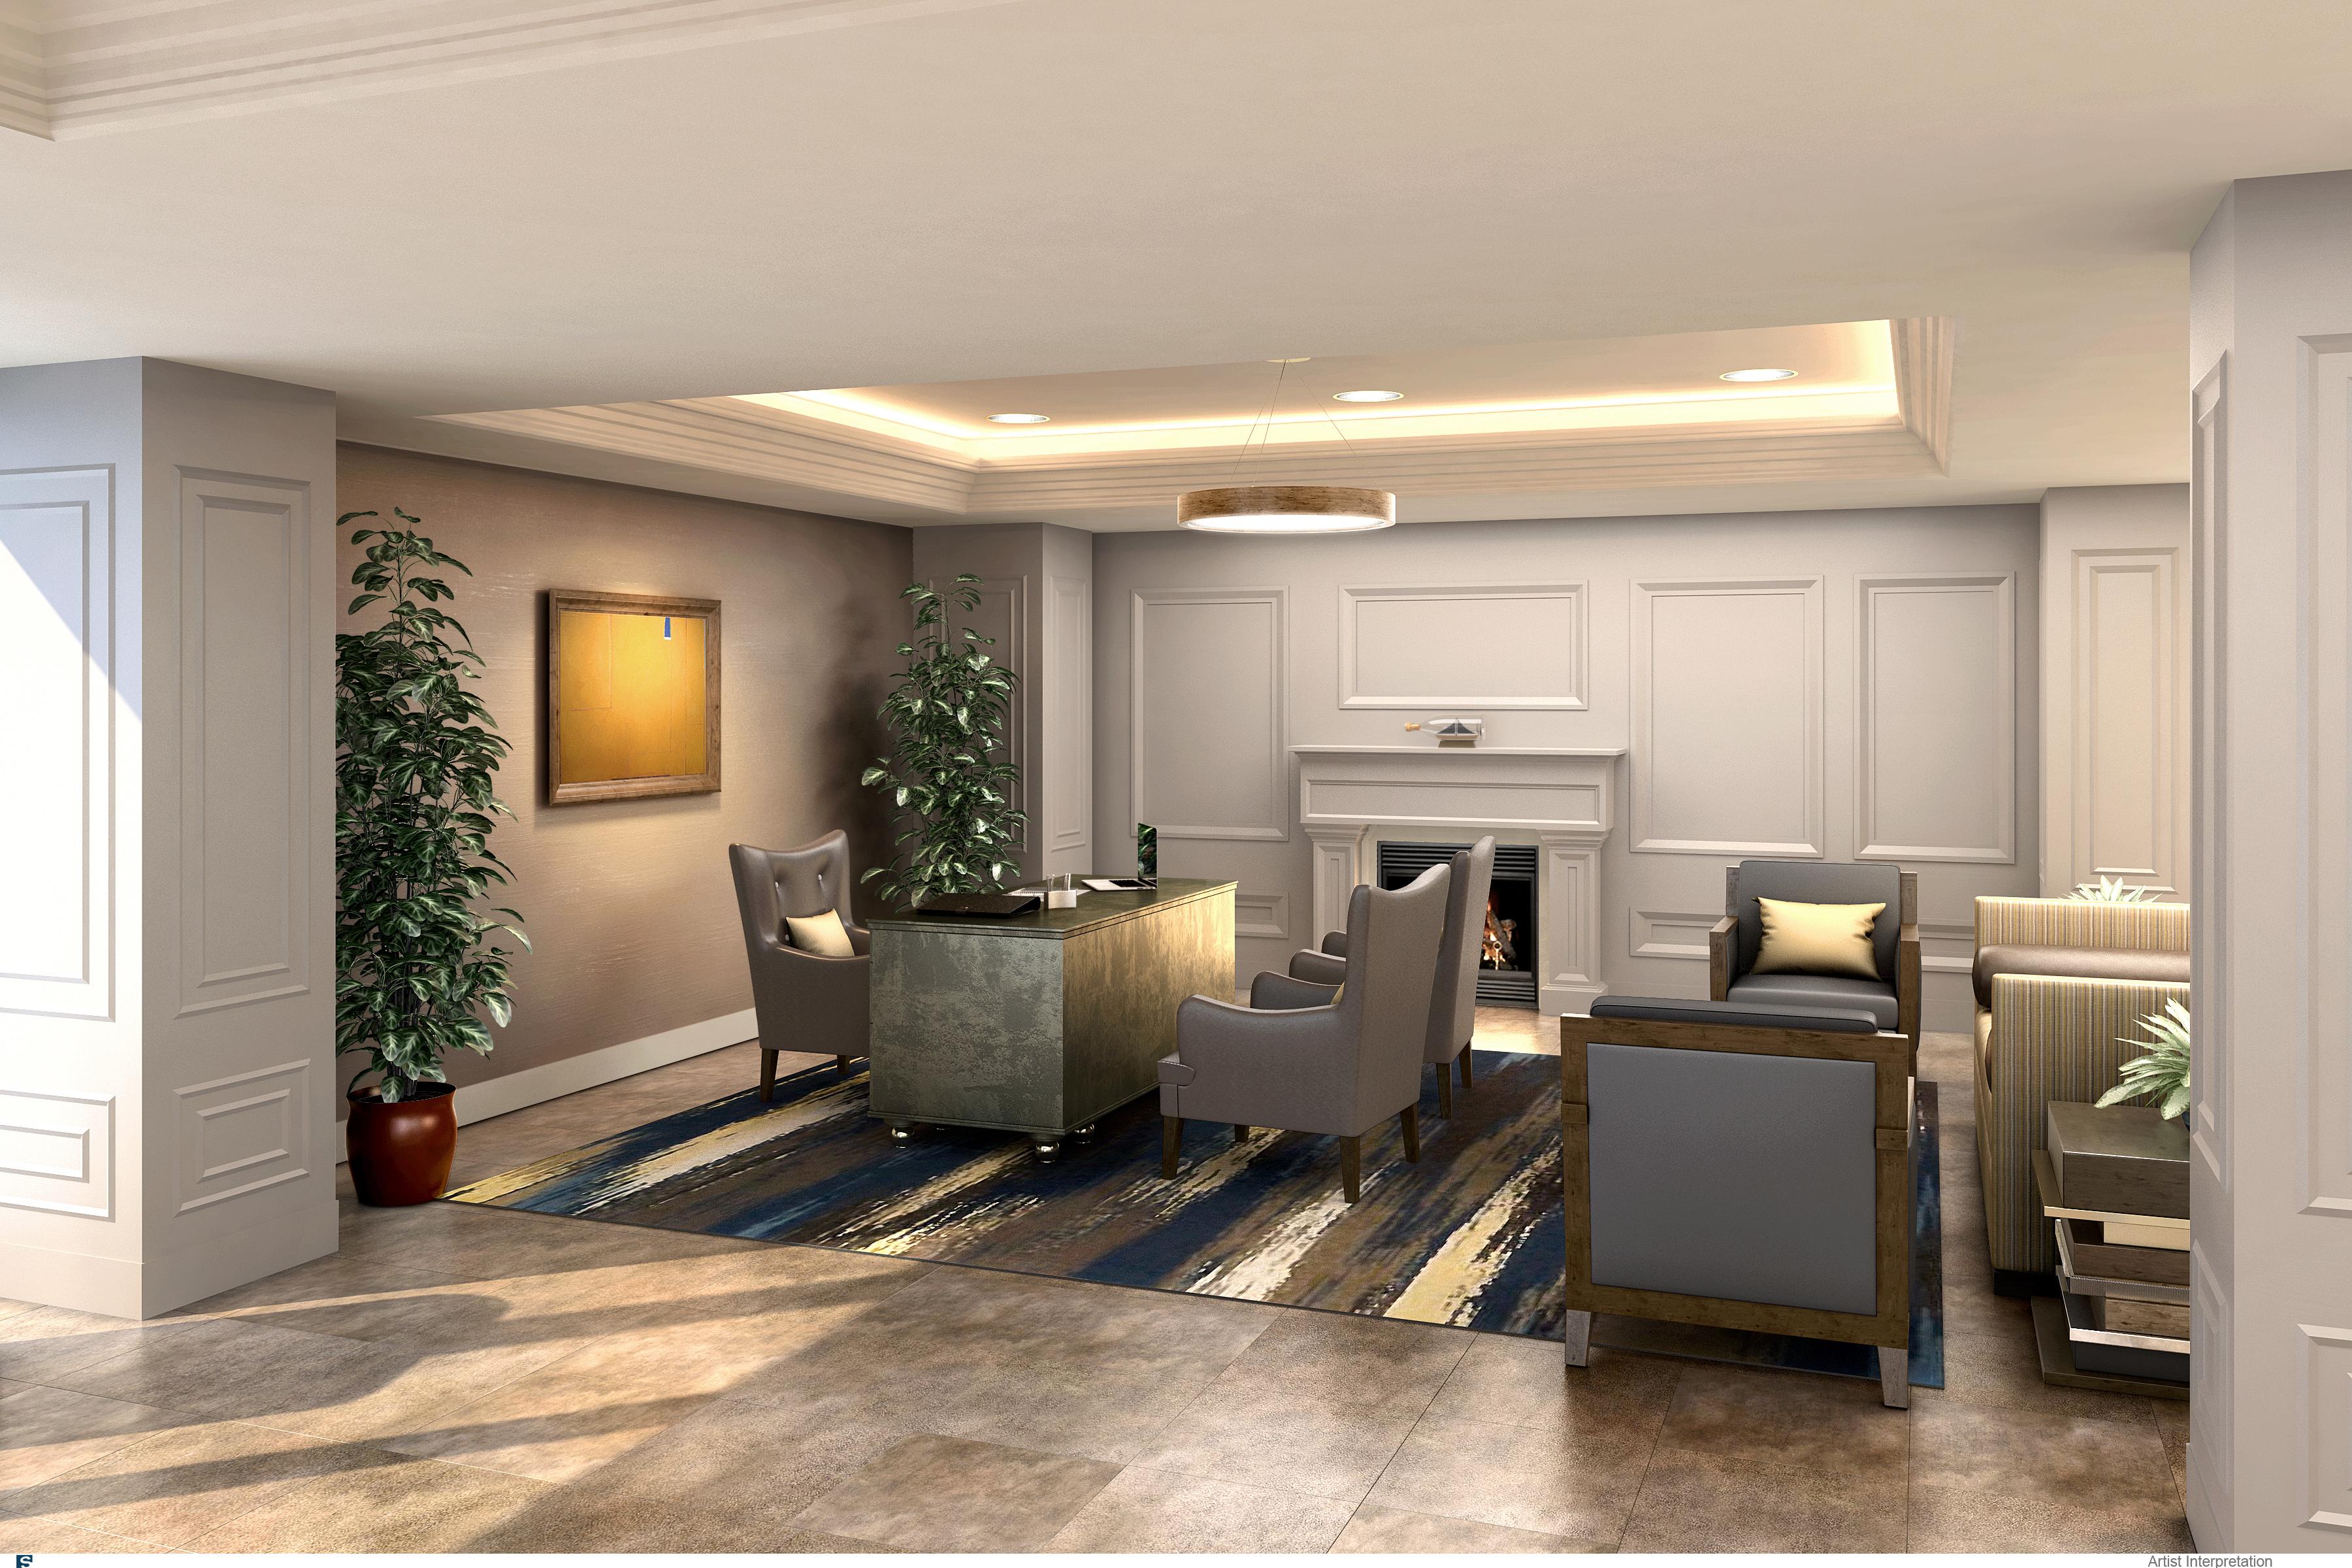 pier 2620 hotel fisherman 39 s wharf in san francisco ca. Black Bedroom Furniture Sets. Home Design Ideas